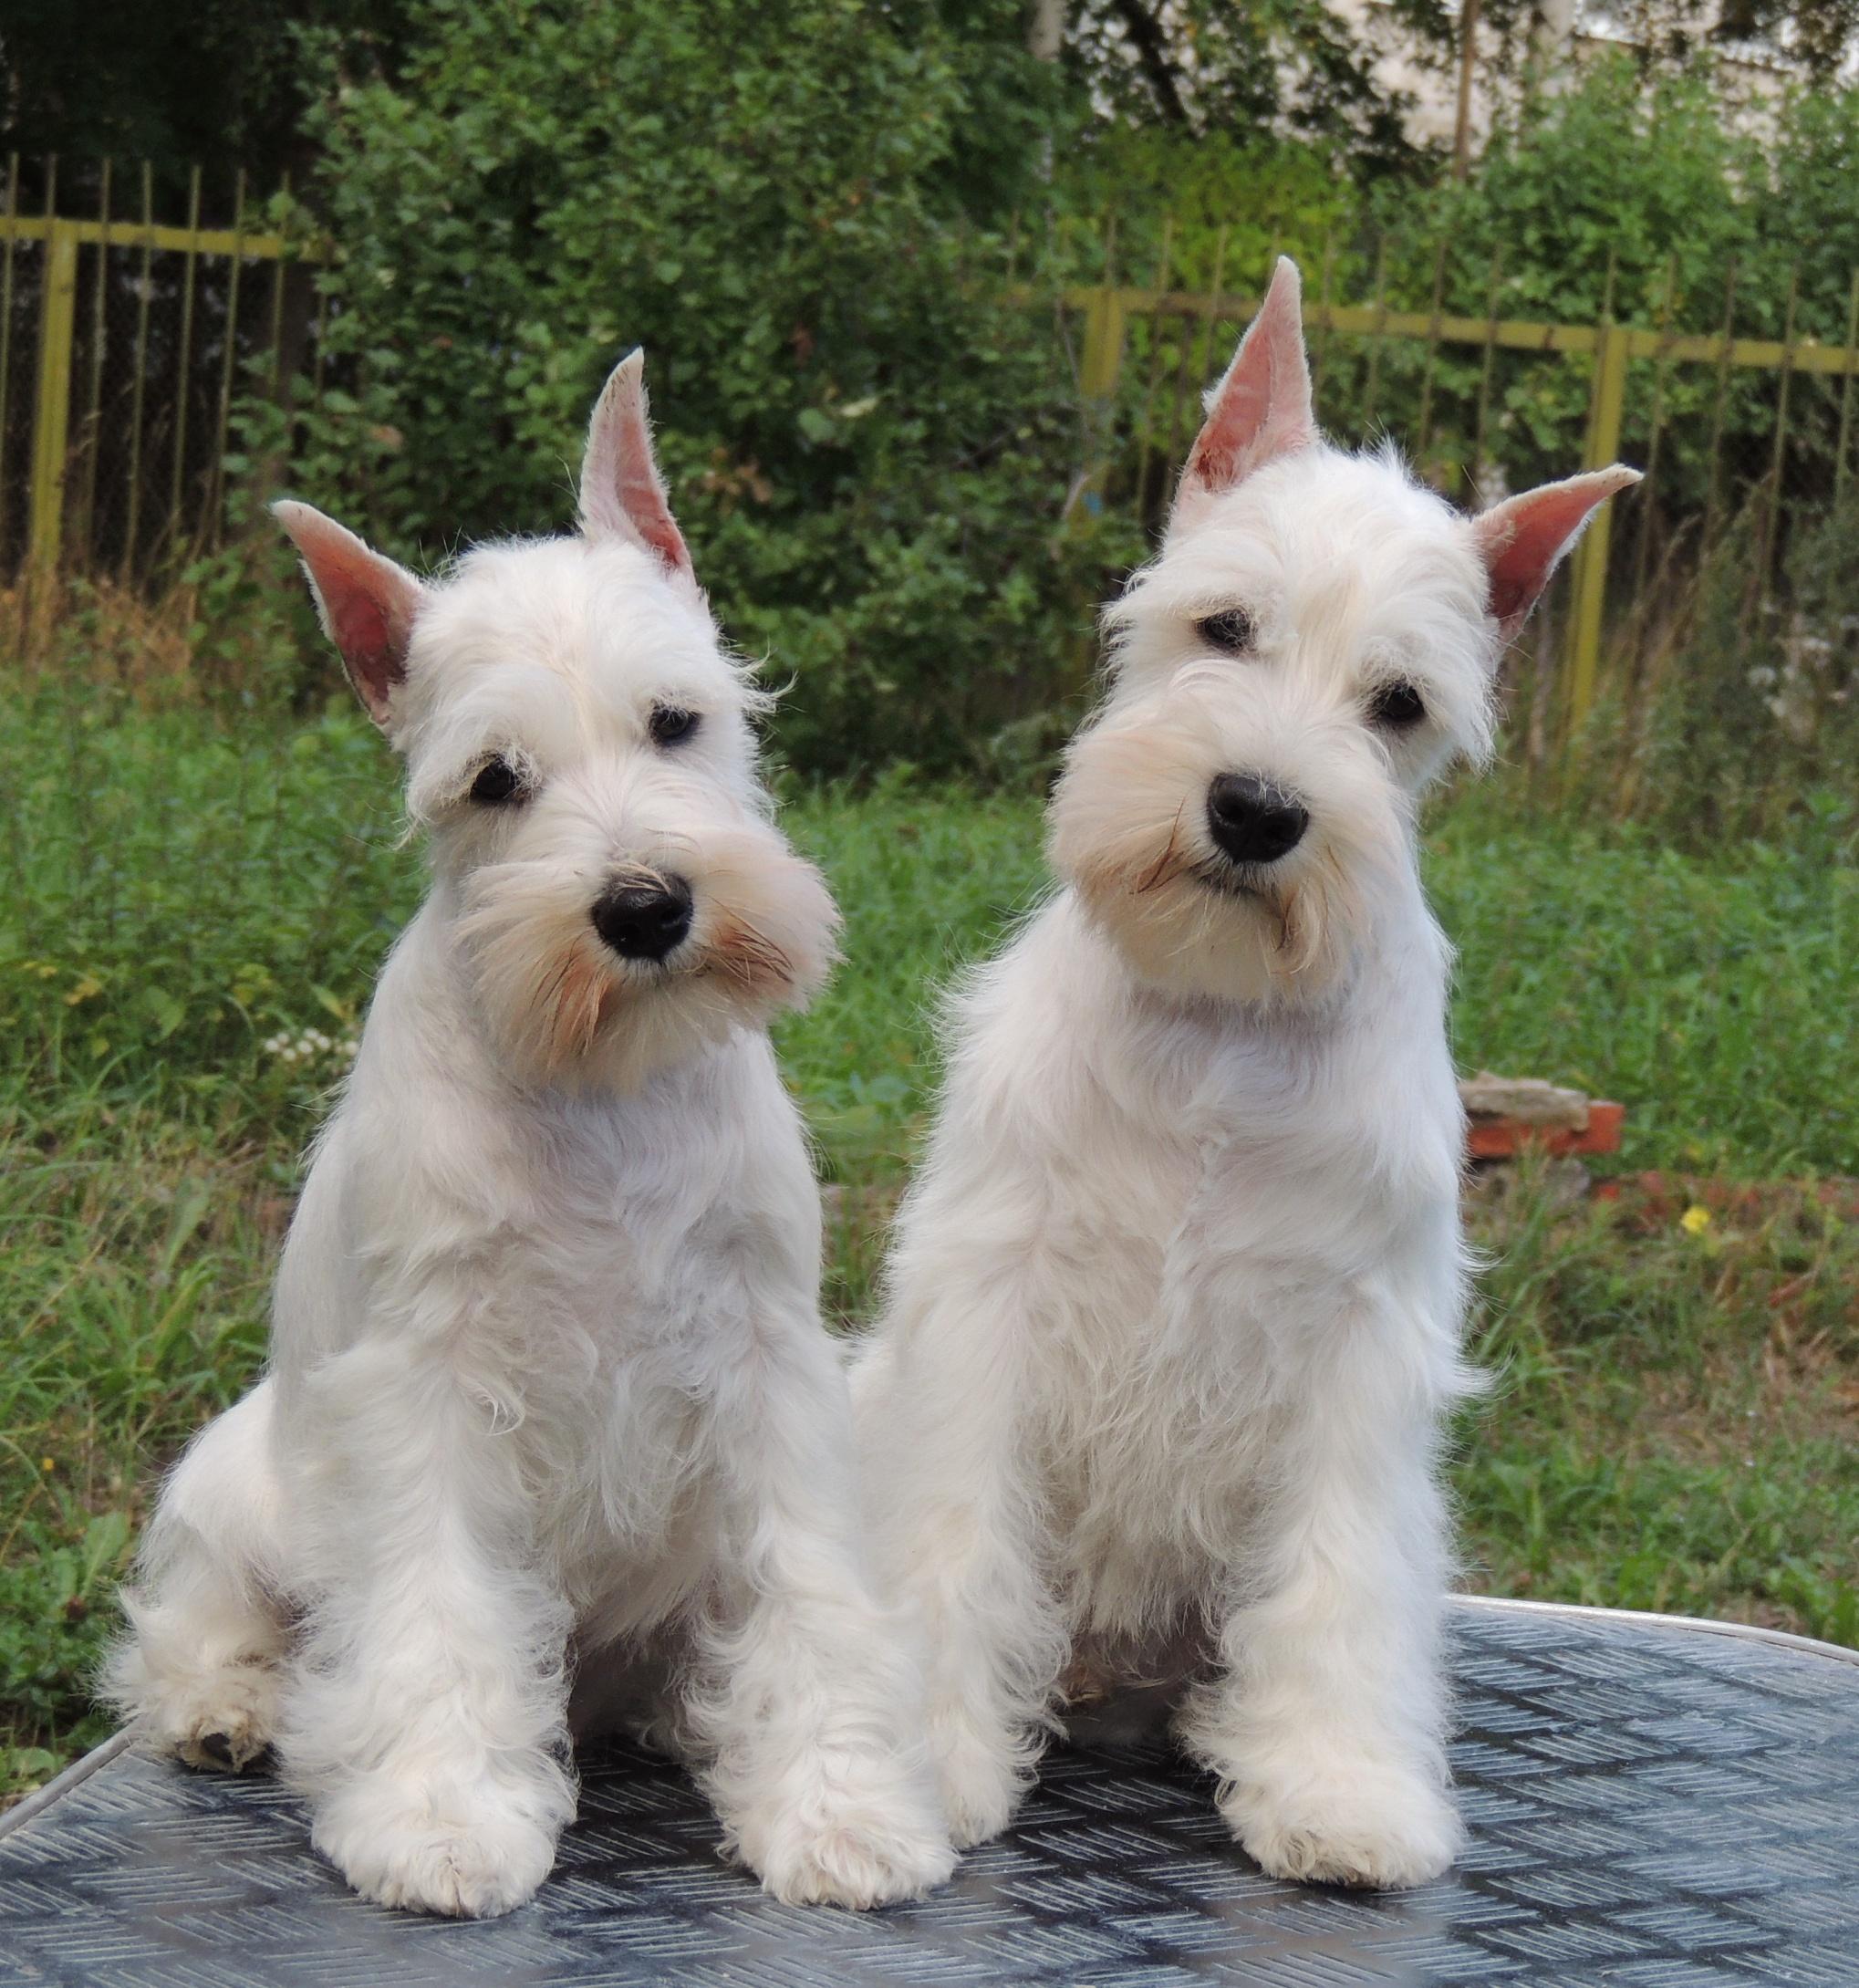 Anjing Putih 53 Gambar Baka Anjing Besar Dan Kecil